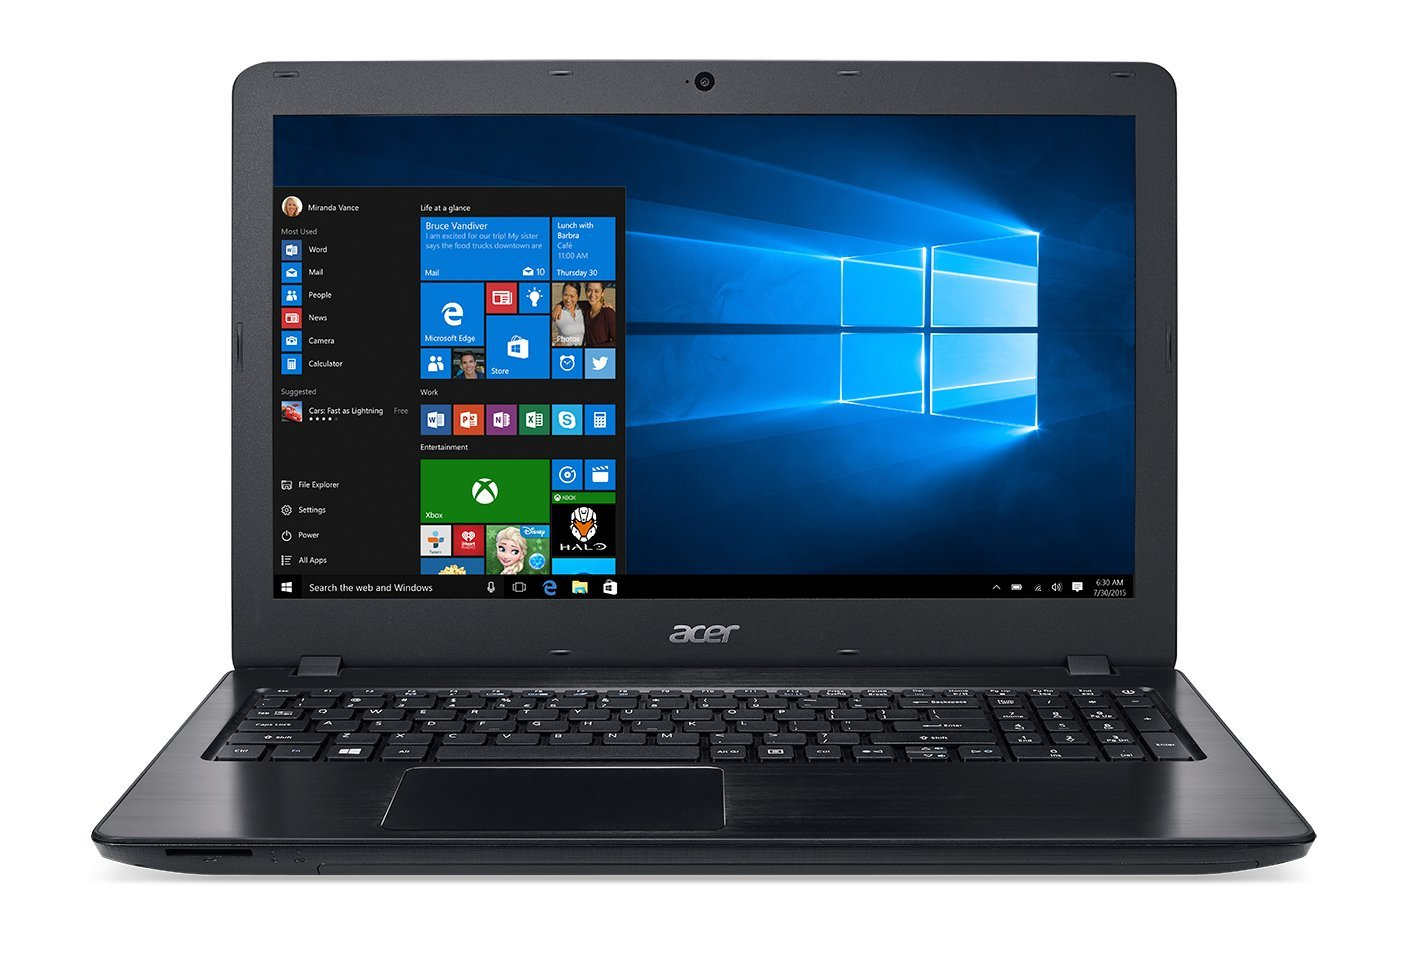 Lenovo ThinkPad Yoga 14 Laptop Motherboard 2GB 48.01107.0011 13323-1 LCB-1